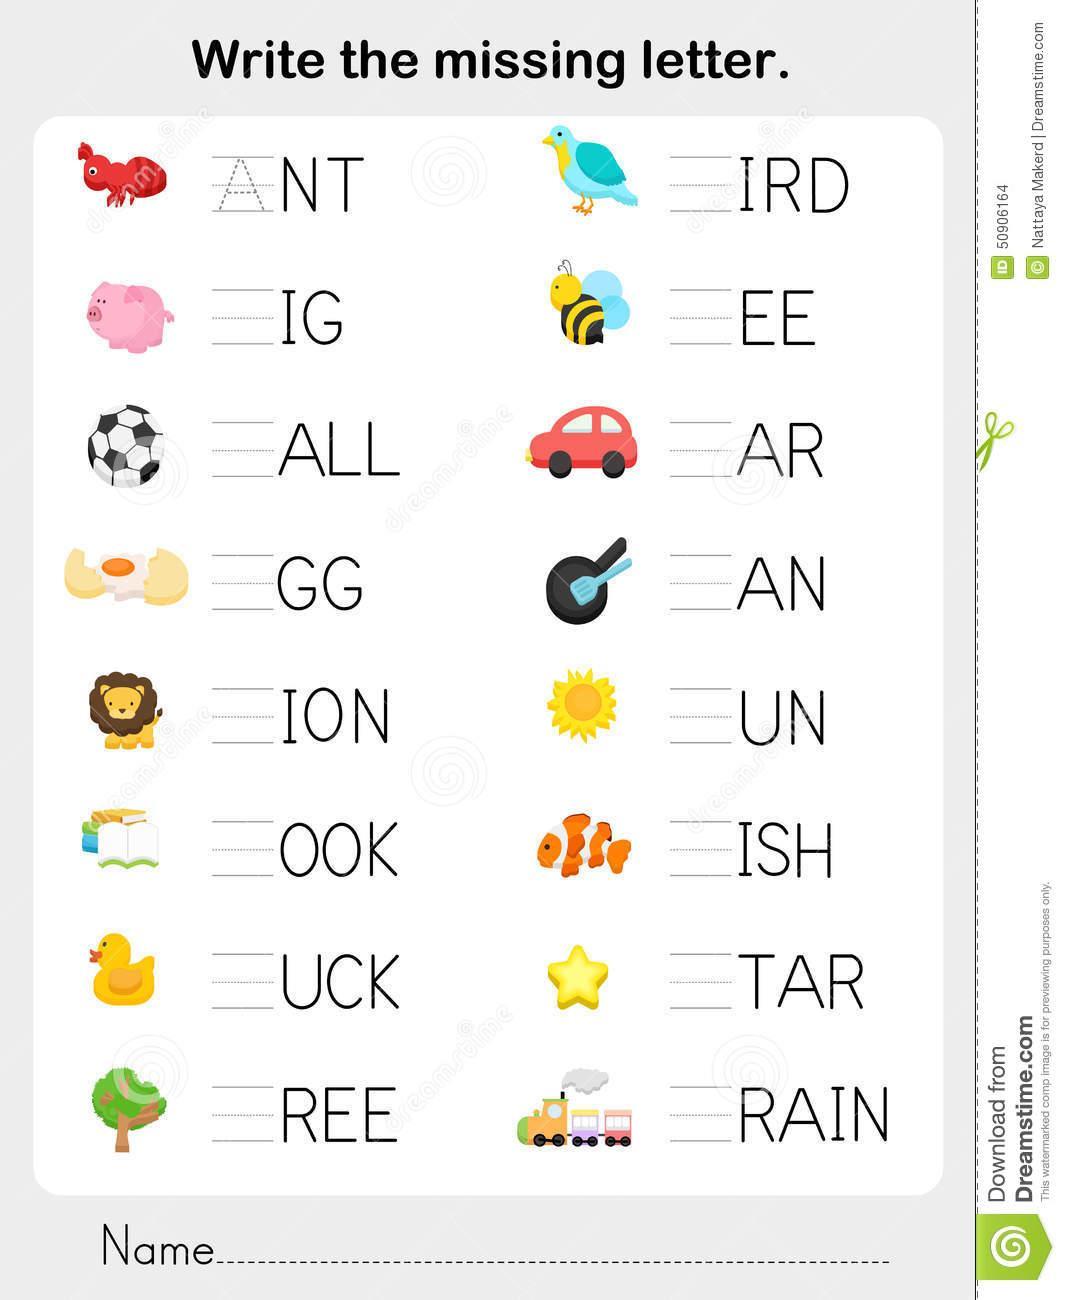 Write Missing Letters Worksheet 1 Letter Worksheets